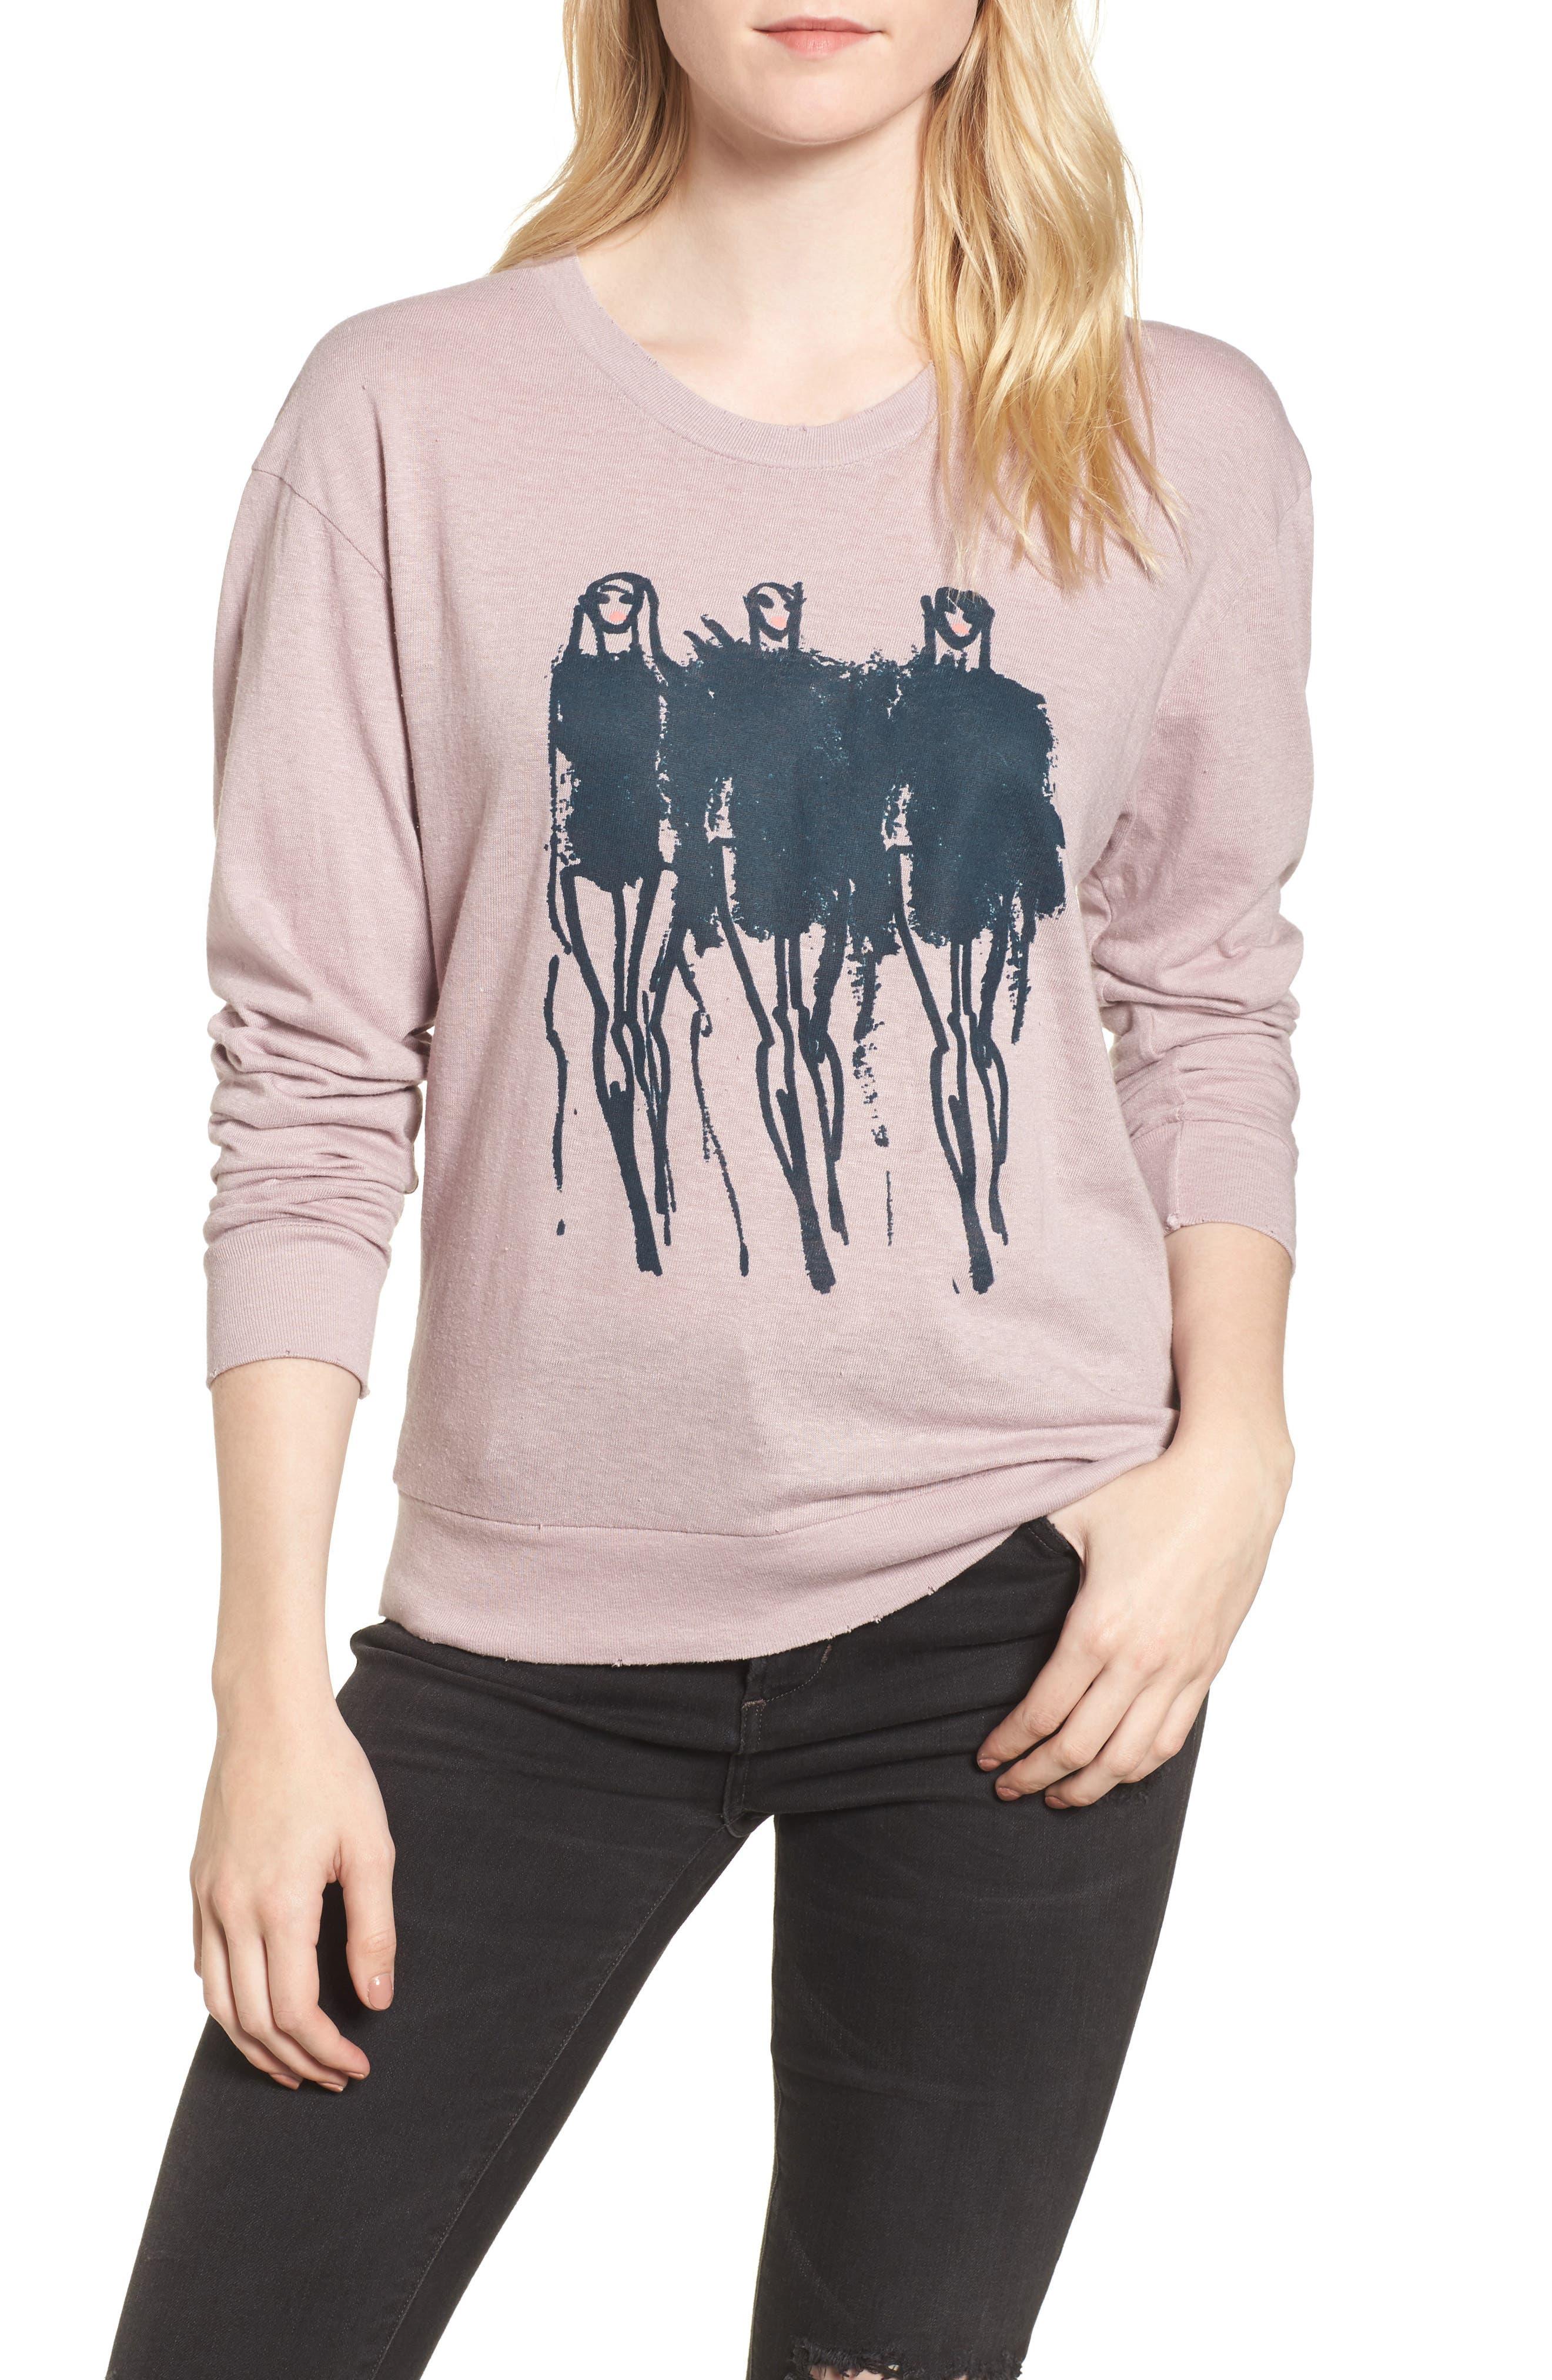 x Donald Robertson Black Dresses Sweatshirt,                         Main,                         color, 670